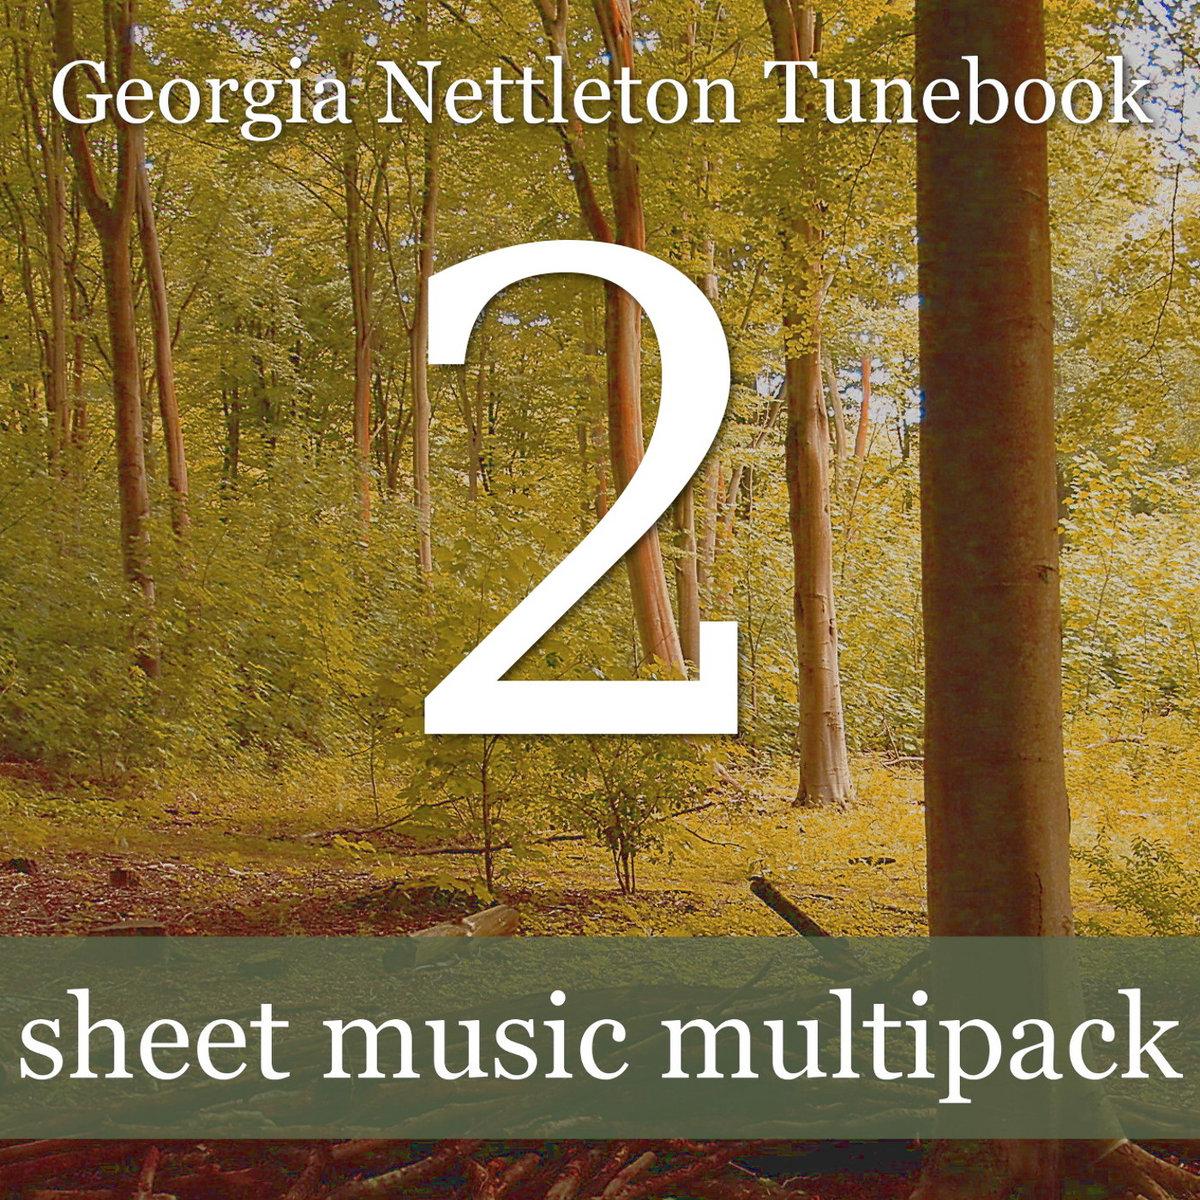 Georgia Nettleton Tunebook 2 - celtic violin solo sheet music with